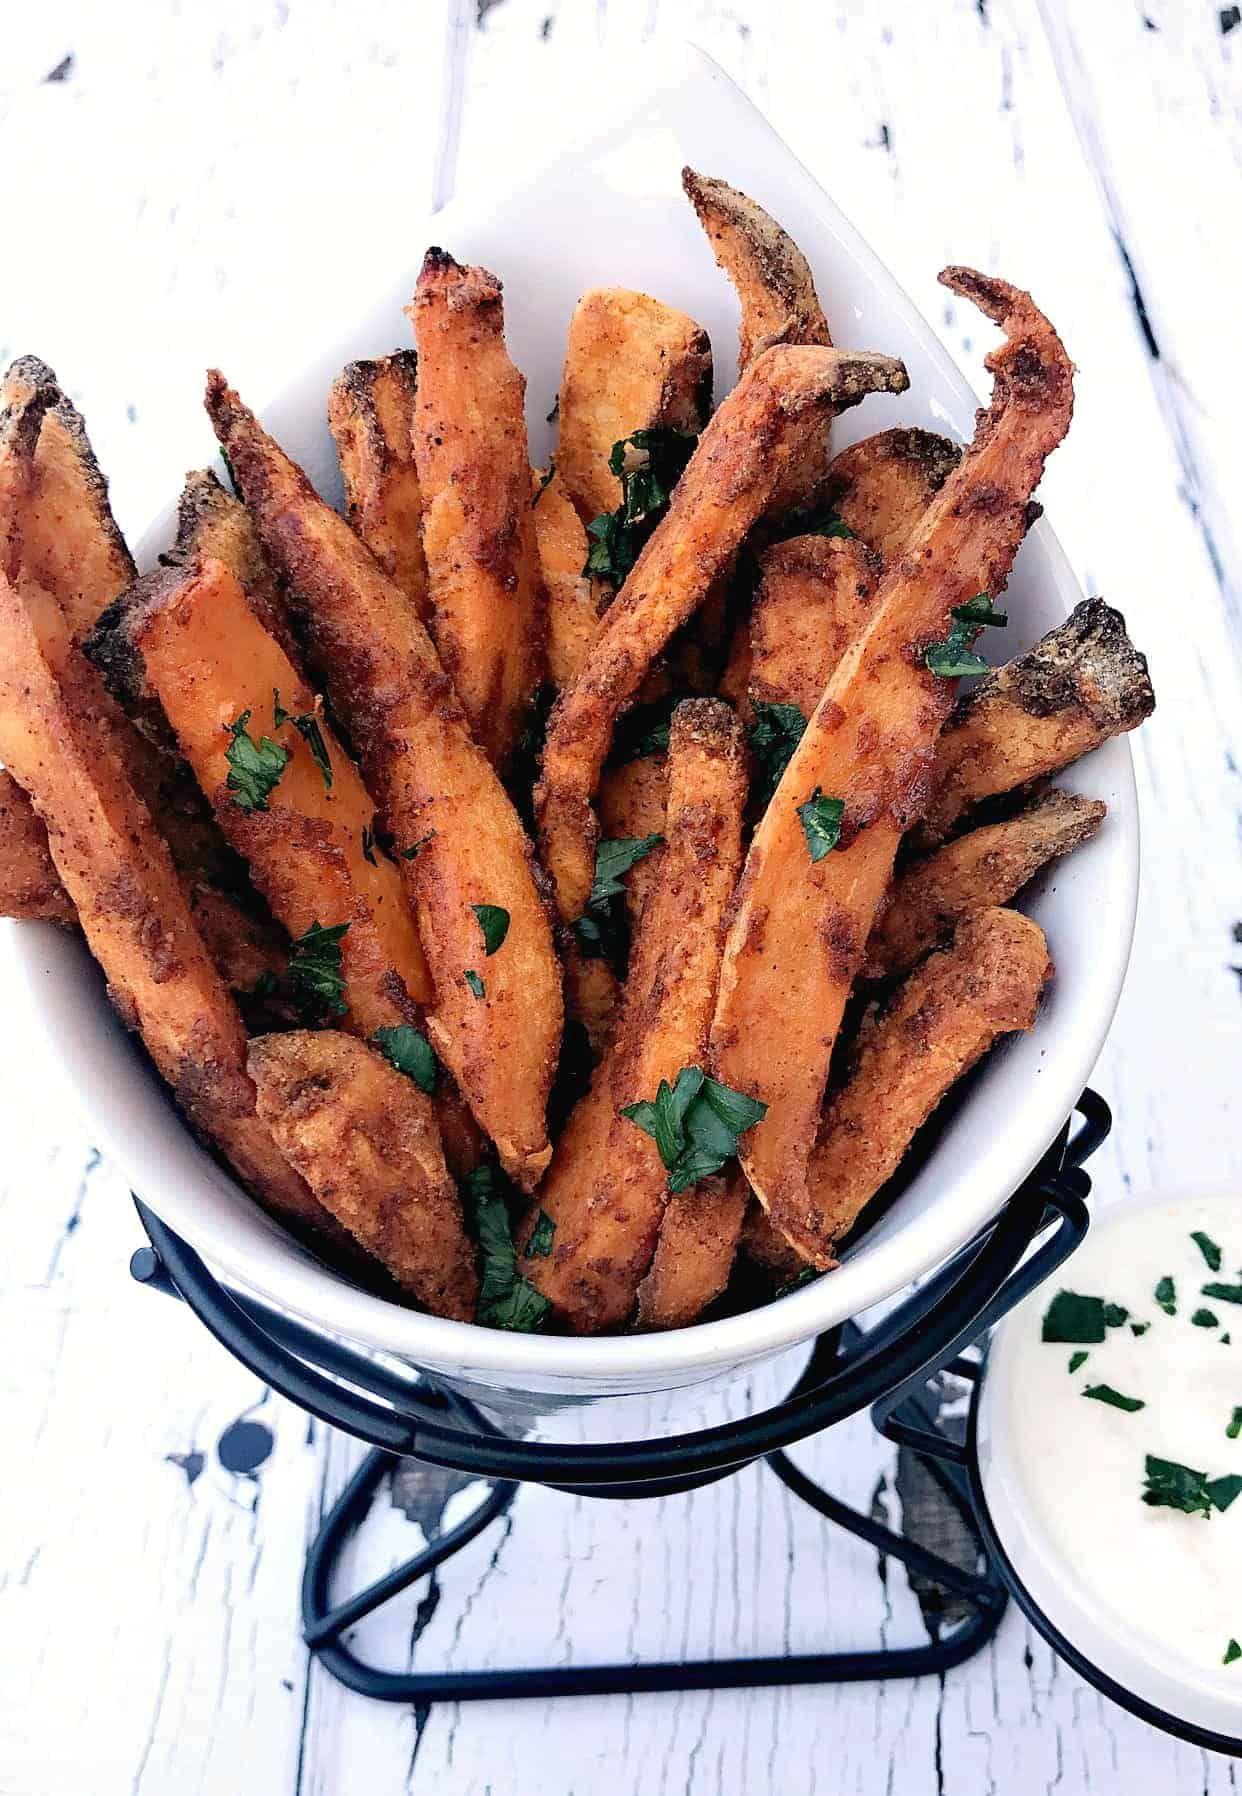 Easy Air Fryer Crispy Crunchy Sweet Potato Fries Recipe